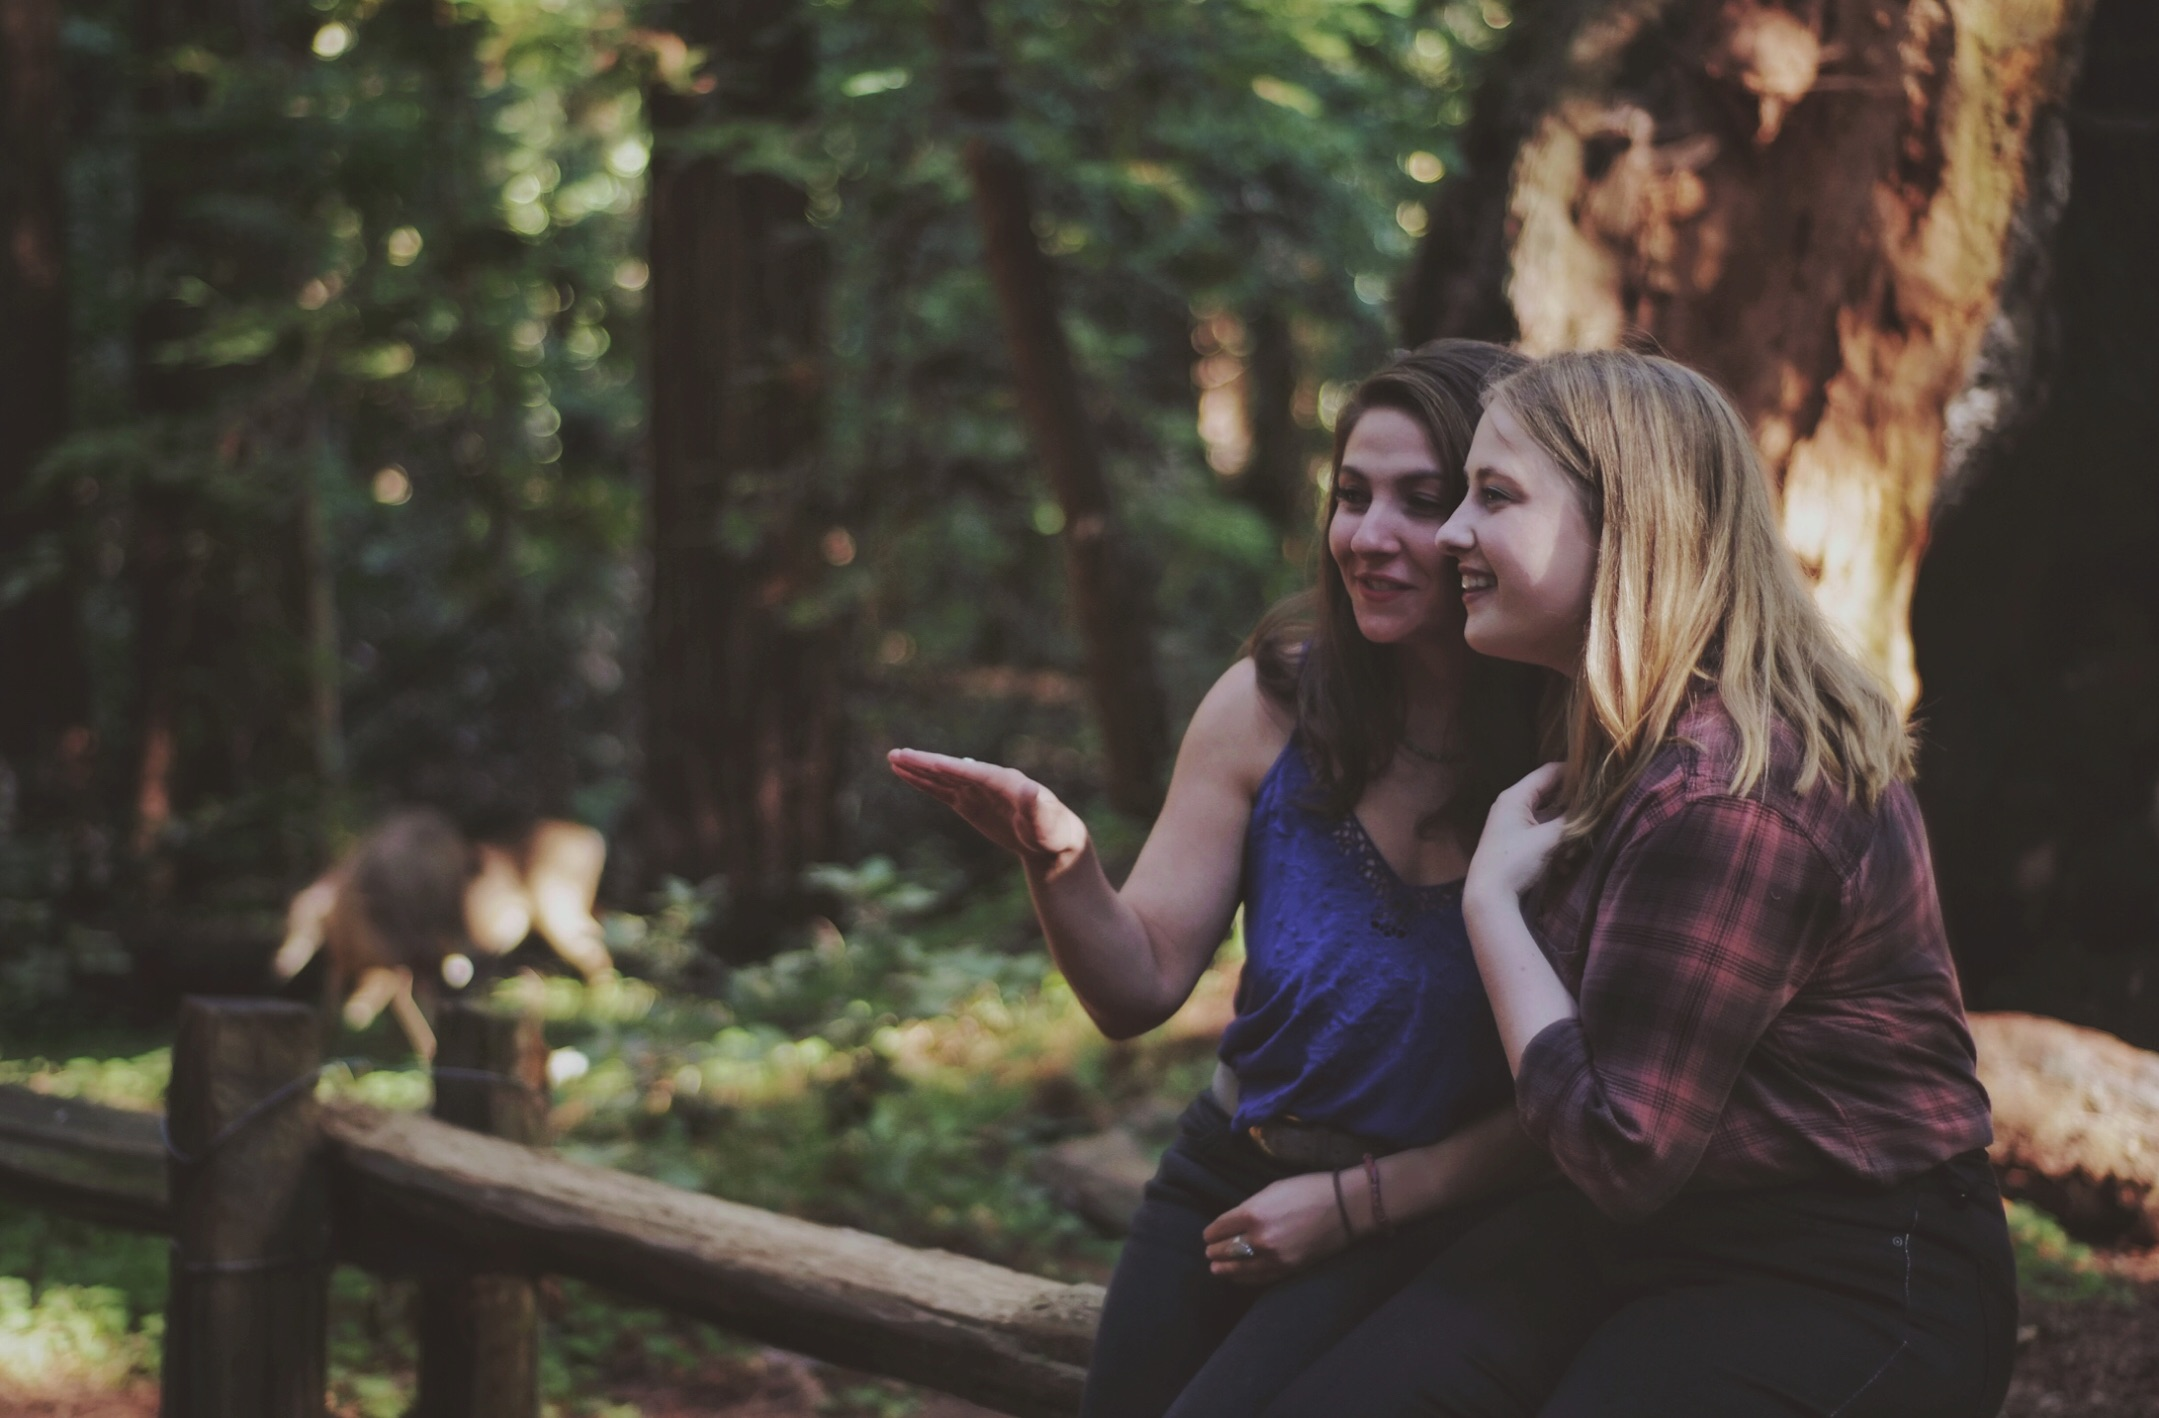 Lauren Chouinard and Lisa Carmack